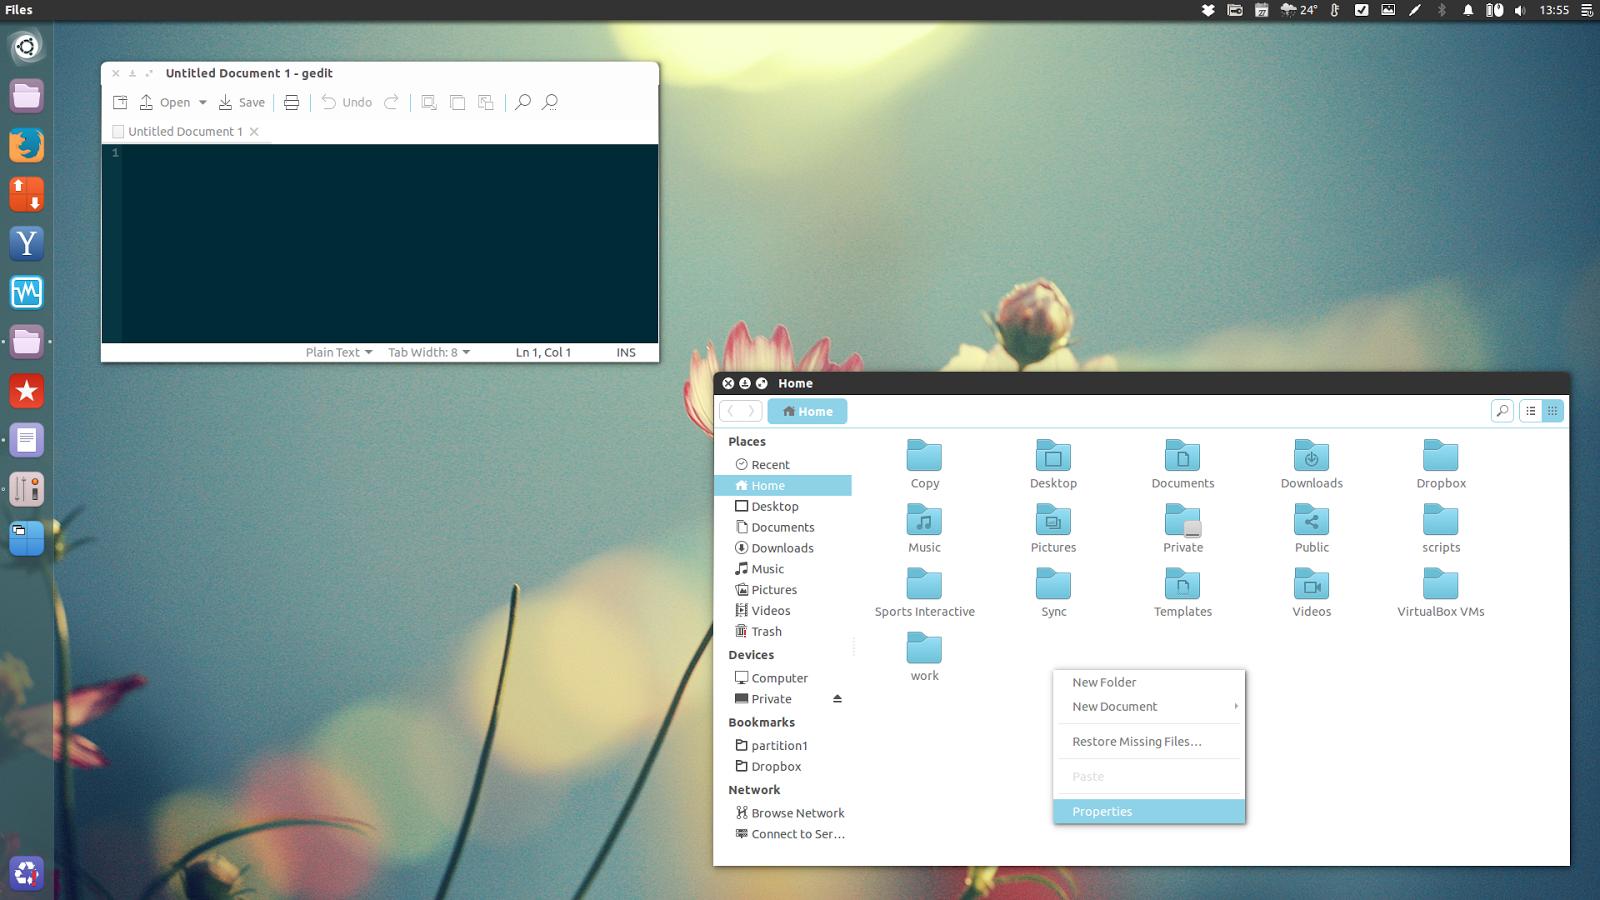 Google themes ubuntu 14.04 - Stark Ceru Gtk Theme Faba Ceru Icon Theme In Unity Ubuntu 14 04